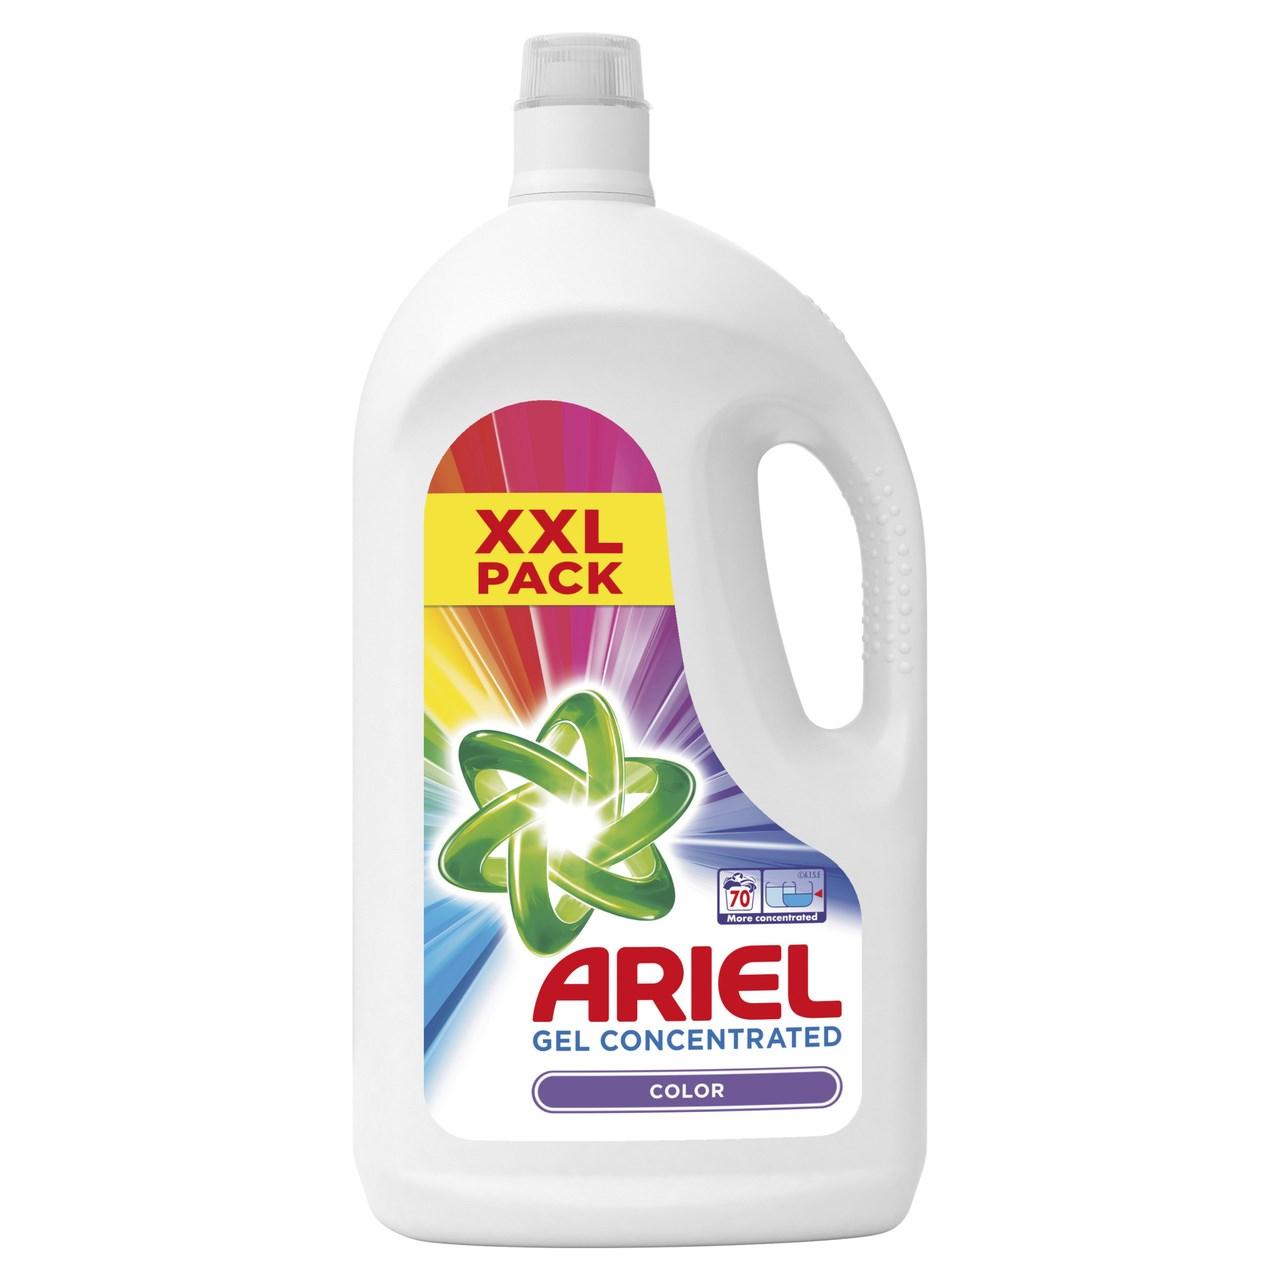 Ariel Color prací gél 70 praní 1x1 ks